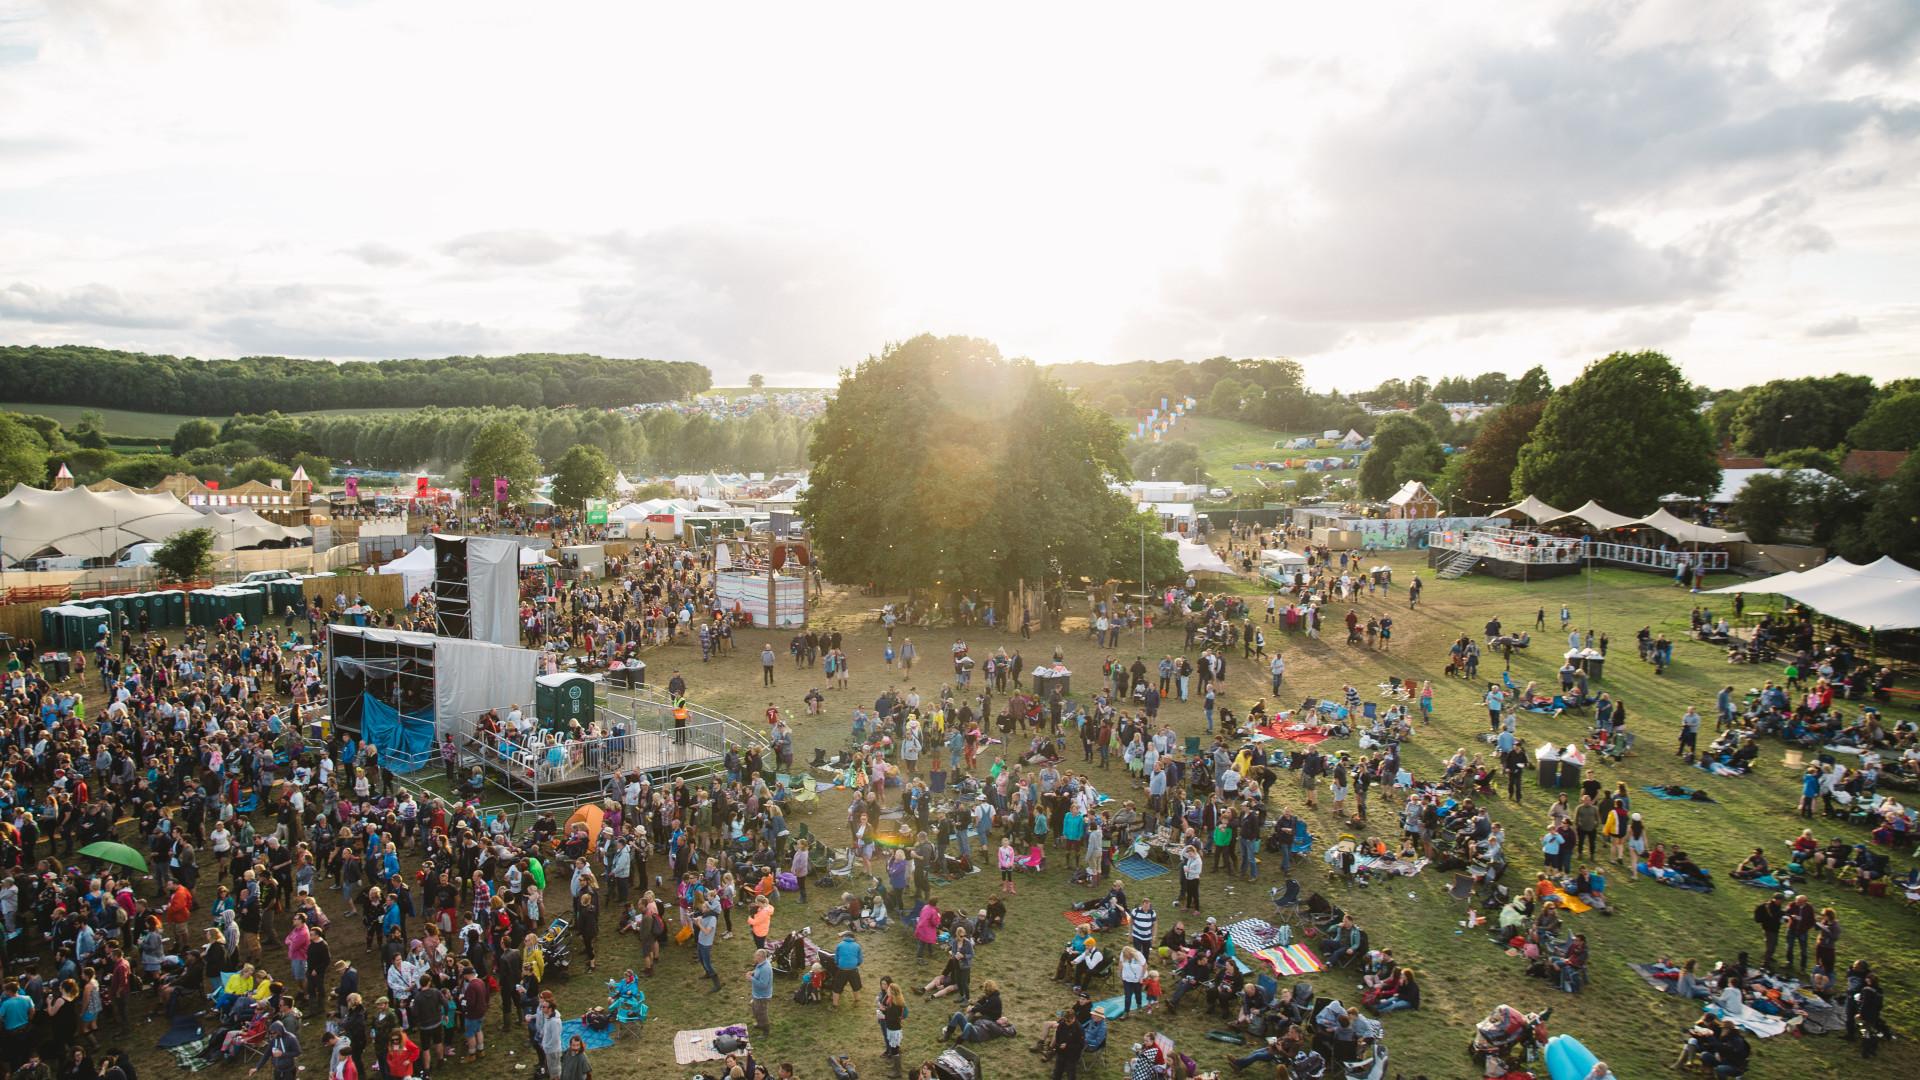 The Standon Calling festival site